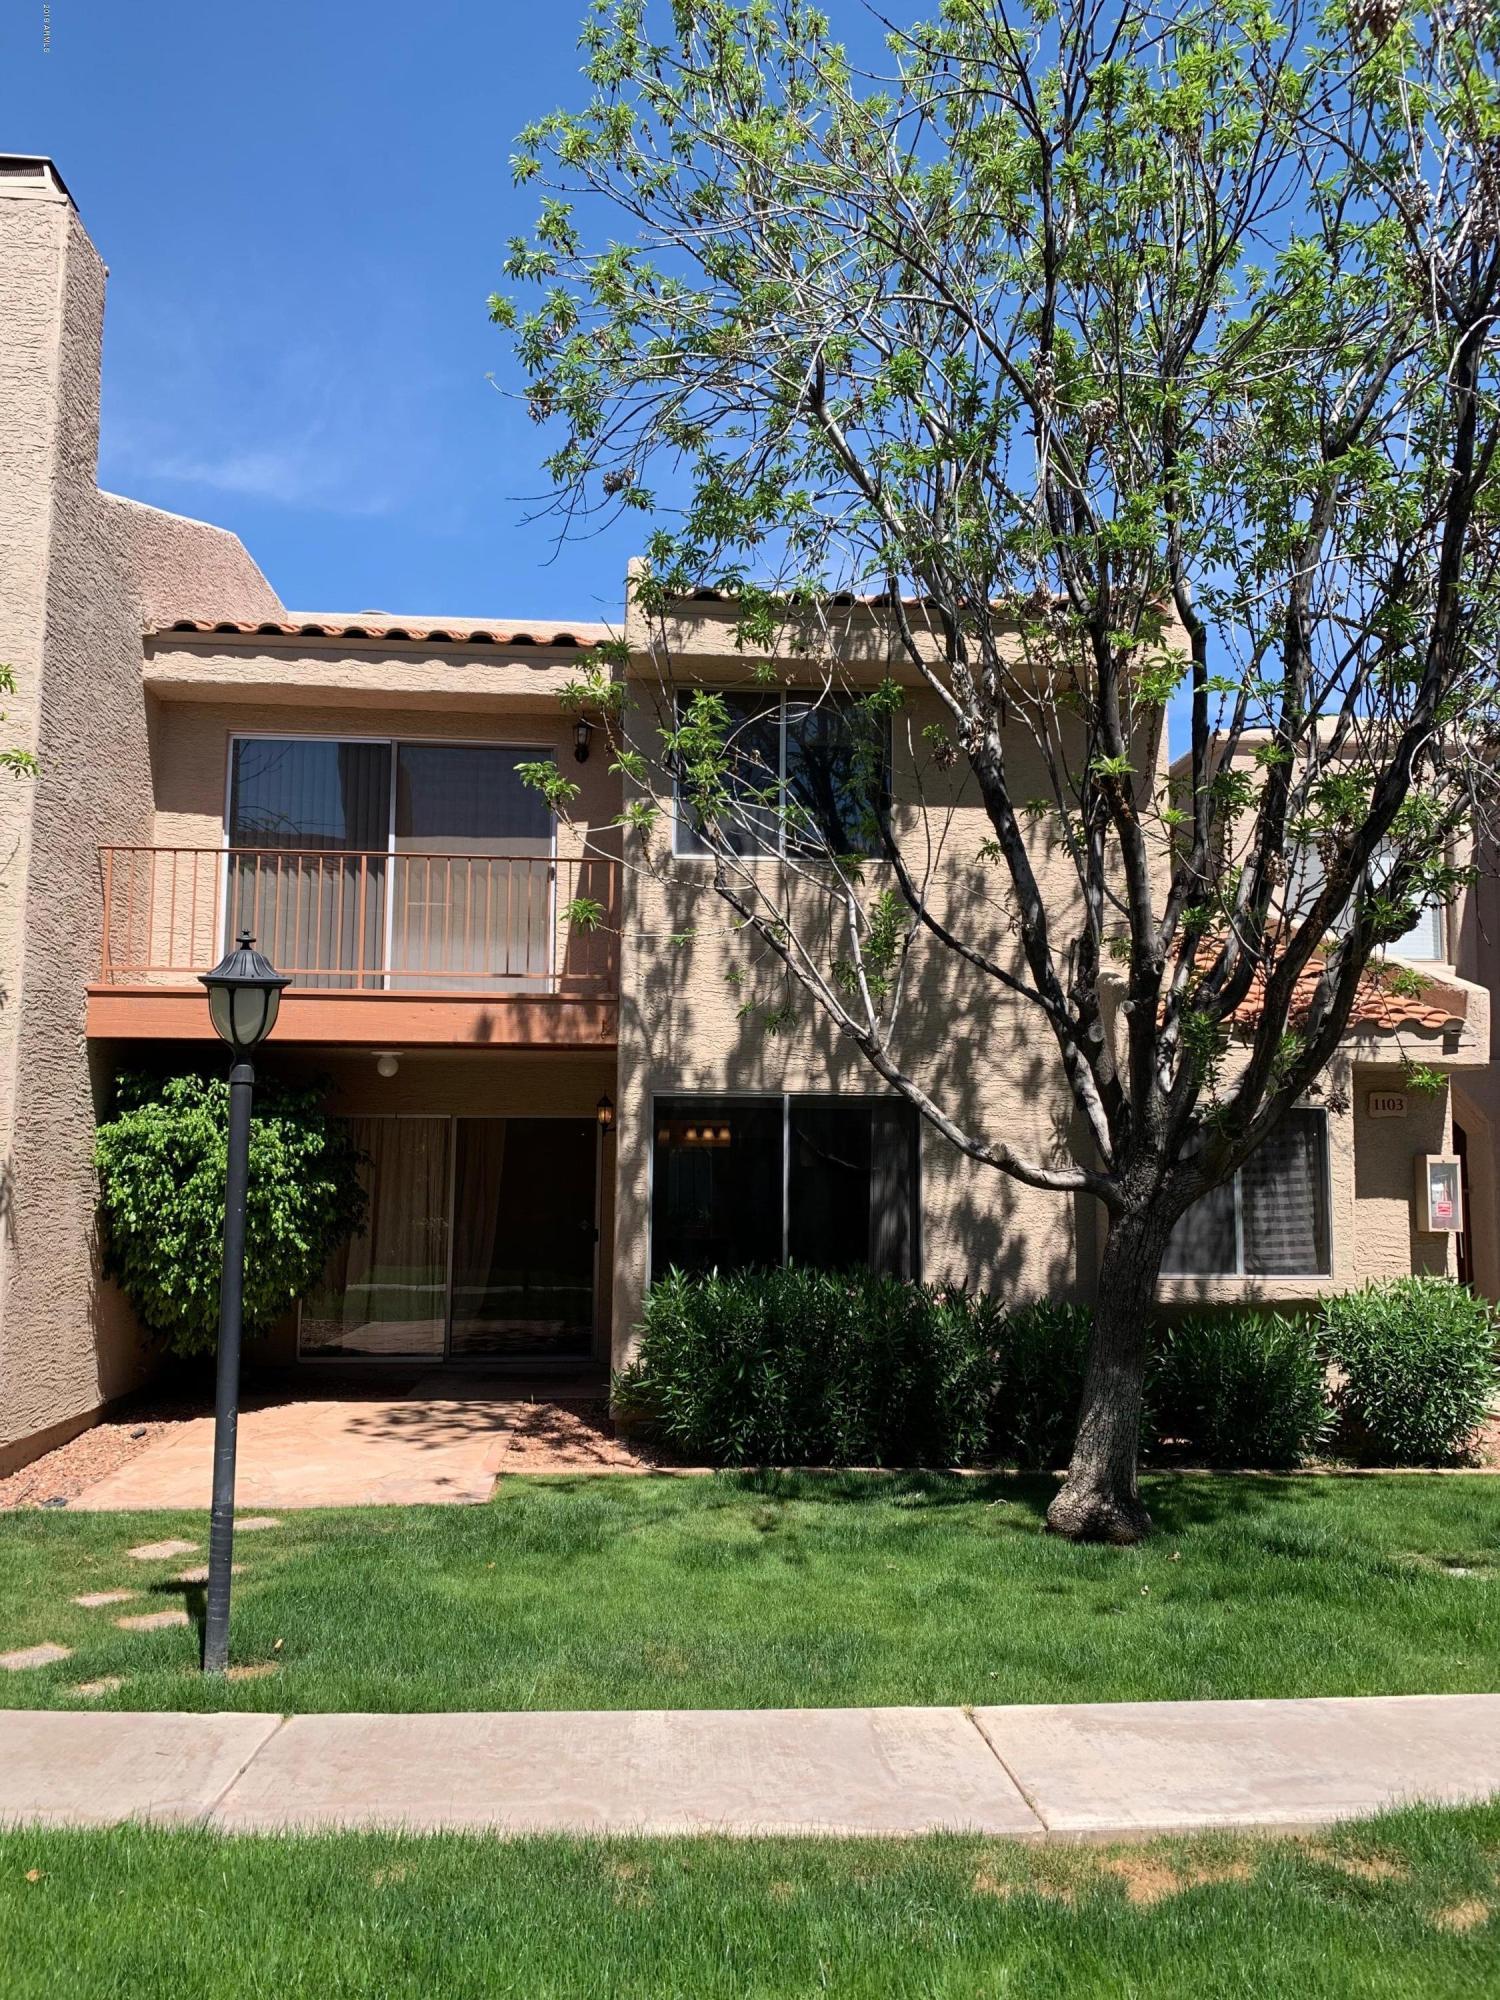 Photo of 2834 S Extension Road #1103, Mesa, AZ 85210